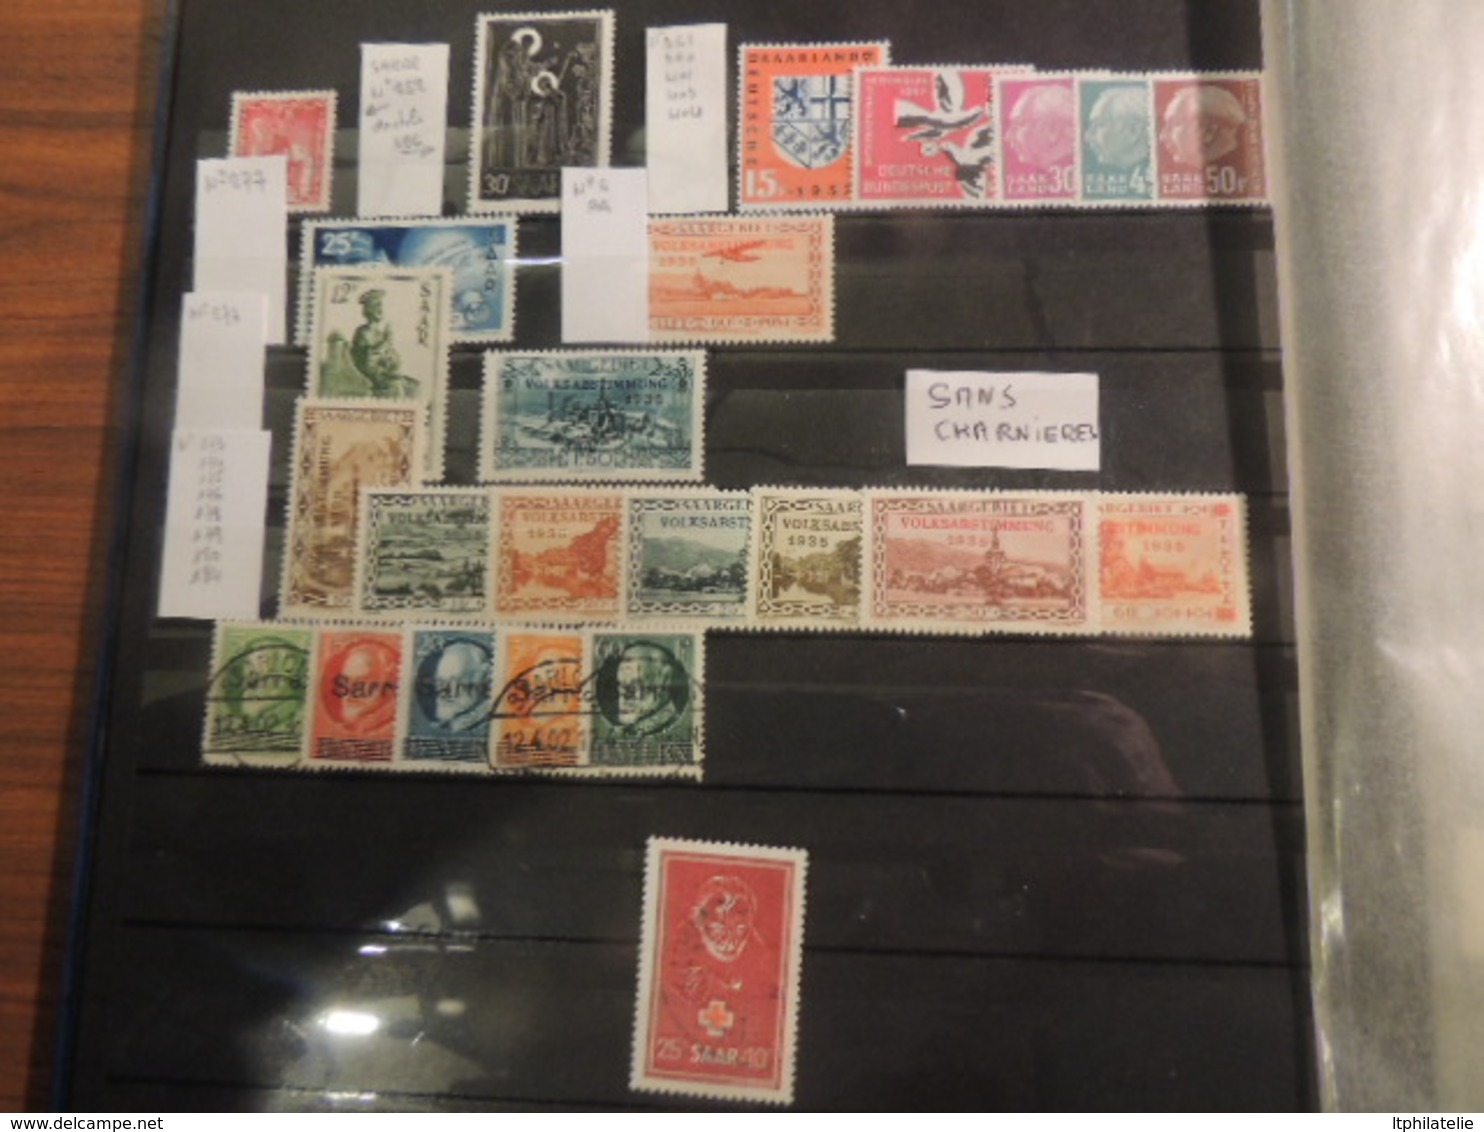 CLASSEUR FRANCE MONDE  SAAR  MAURITIUS ESPAGNE TIMBRES **   OBLITERES  BLOCS  ENSEMBLE TRES PROPRE - Collections (with Albums)